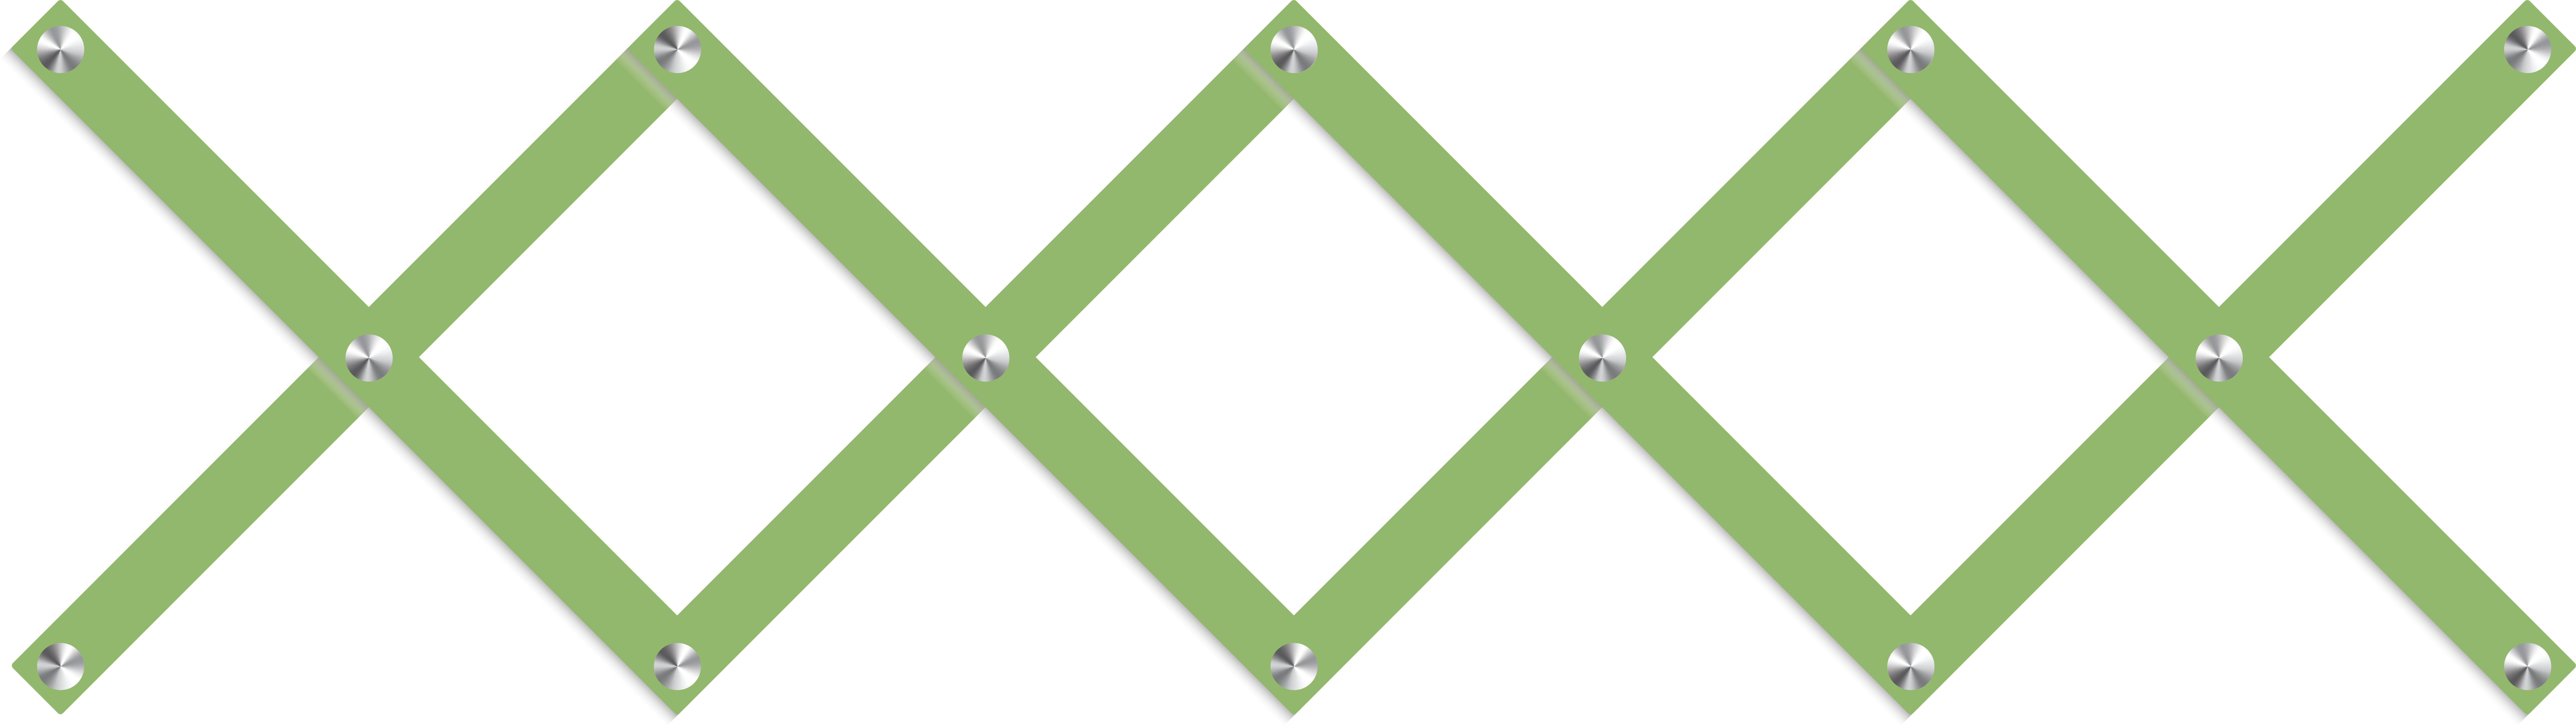 queence Garderobenleiste »Jens«, 14 Haken & 8 Garderobenleisten kaufen